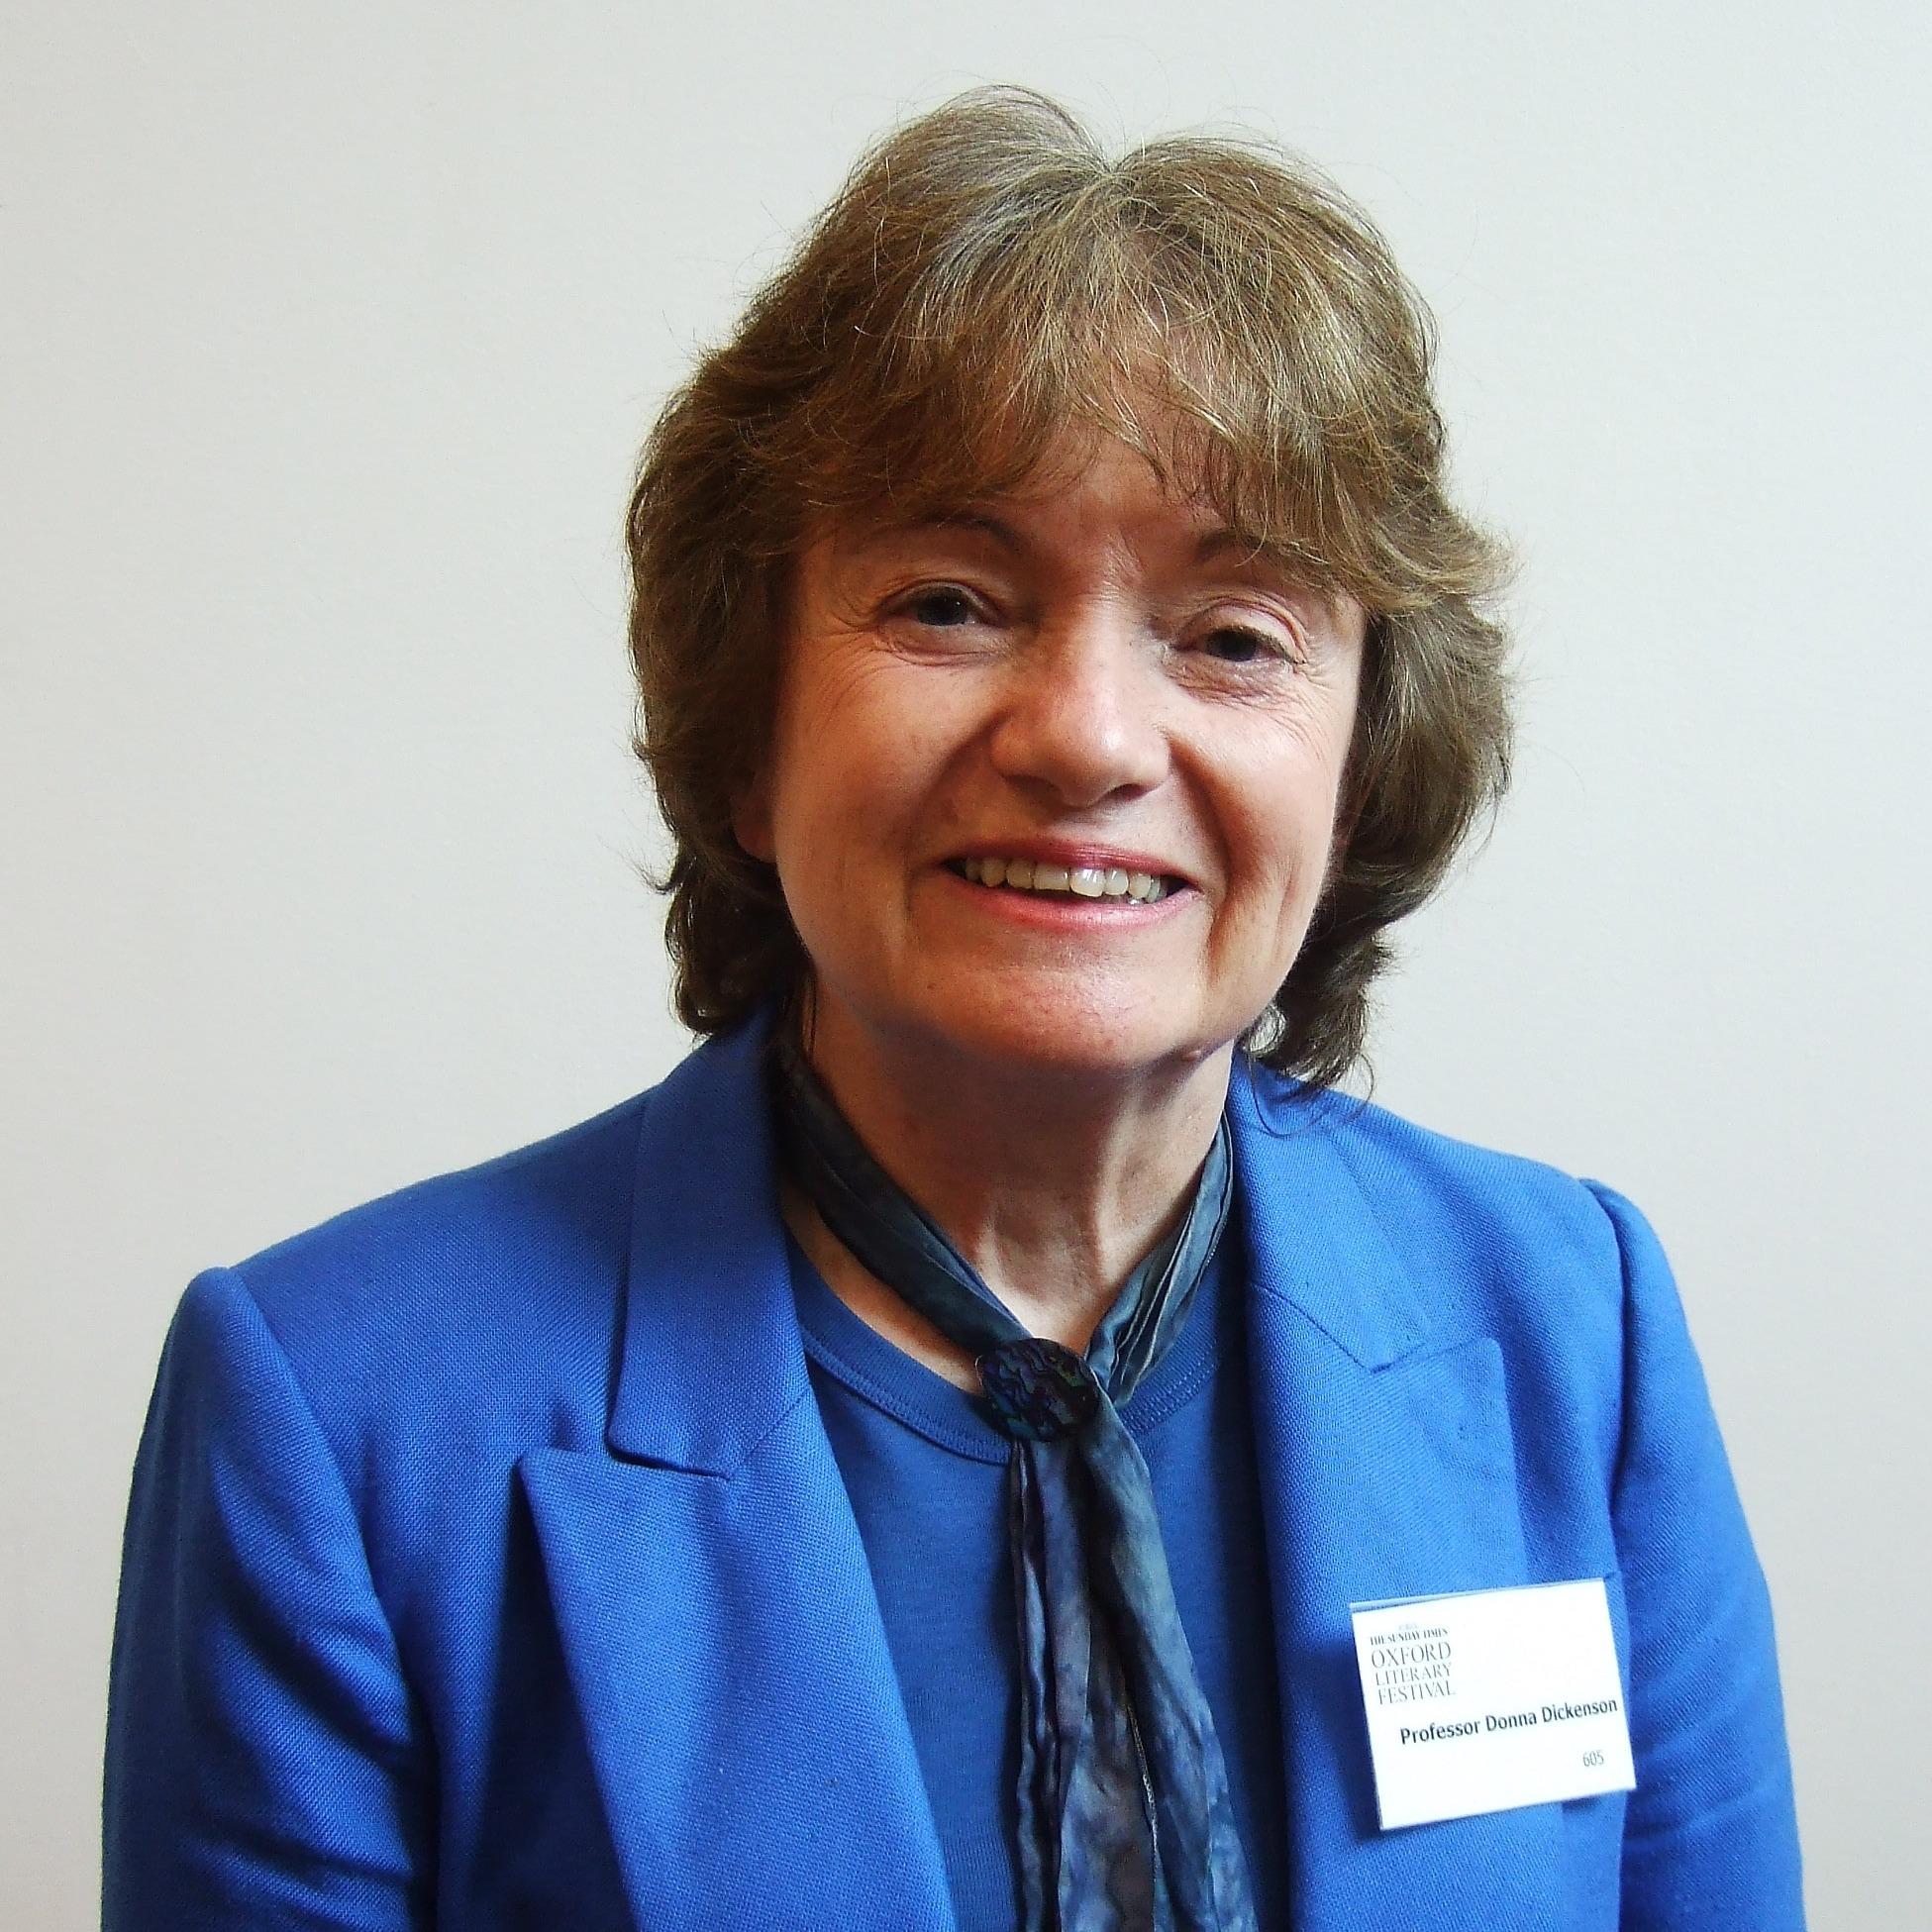 Donna Dickenson at the 2012 Oxford Literary Festival